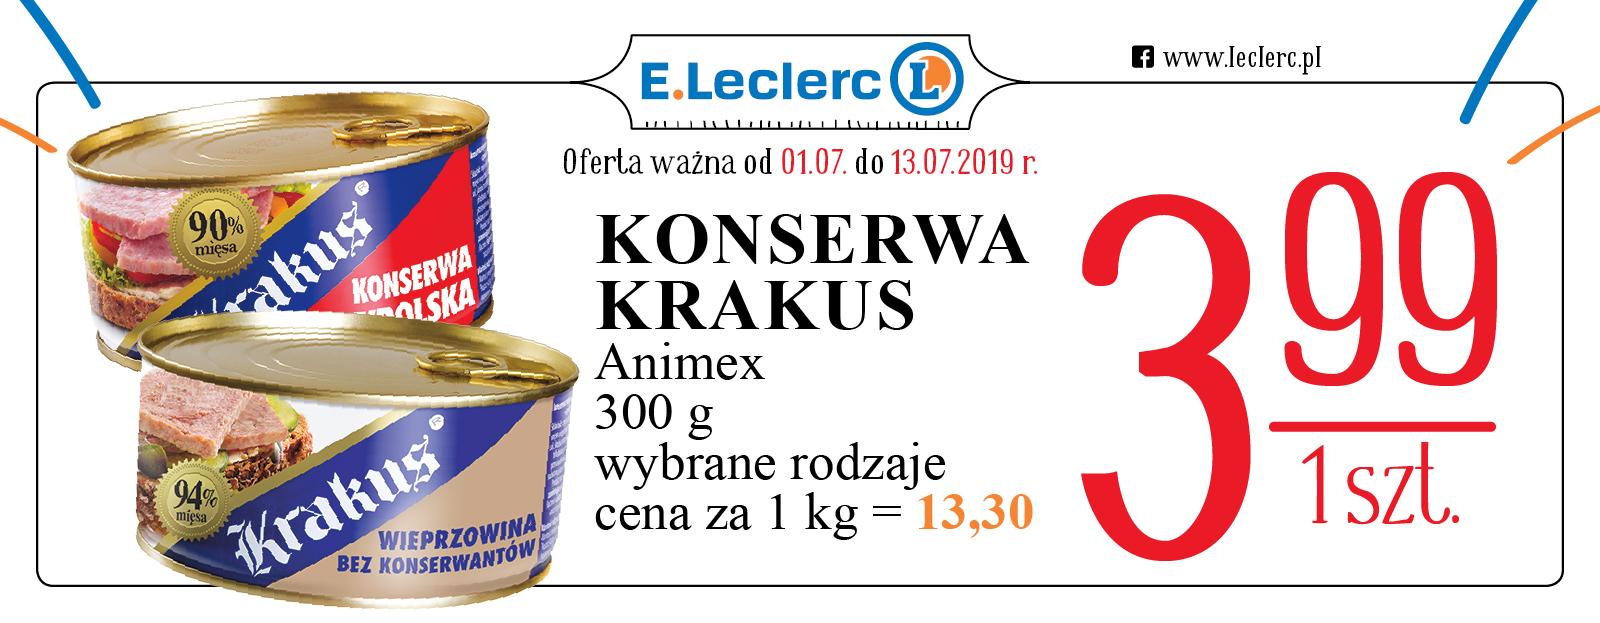 a05f7fb7f LECLERC POLSKA   Strona główna